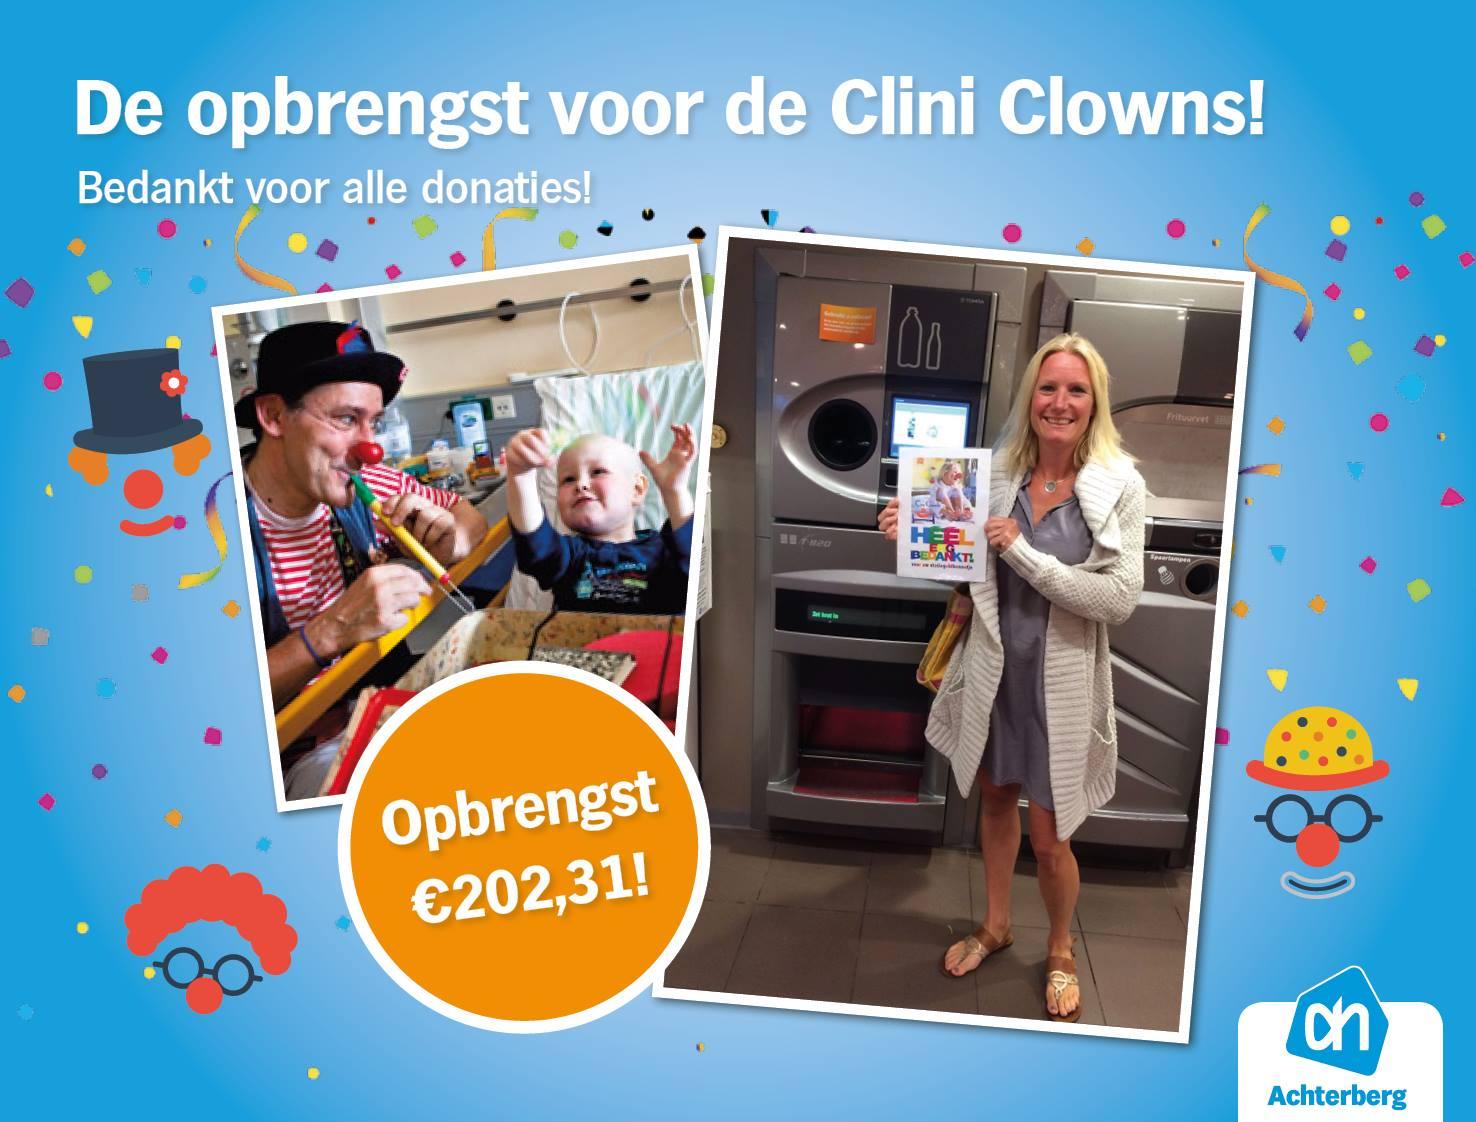 De opbrengst voor de Clini Clowns!